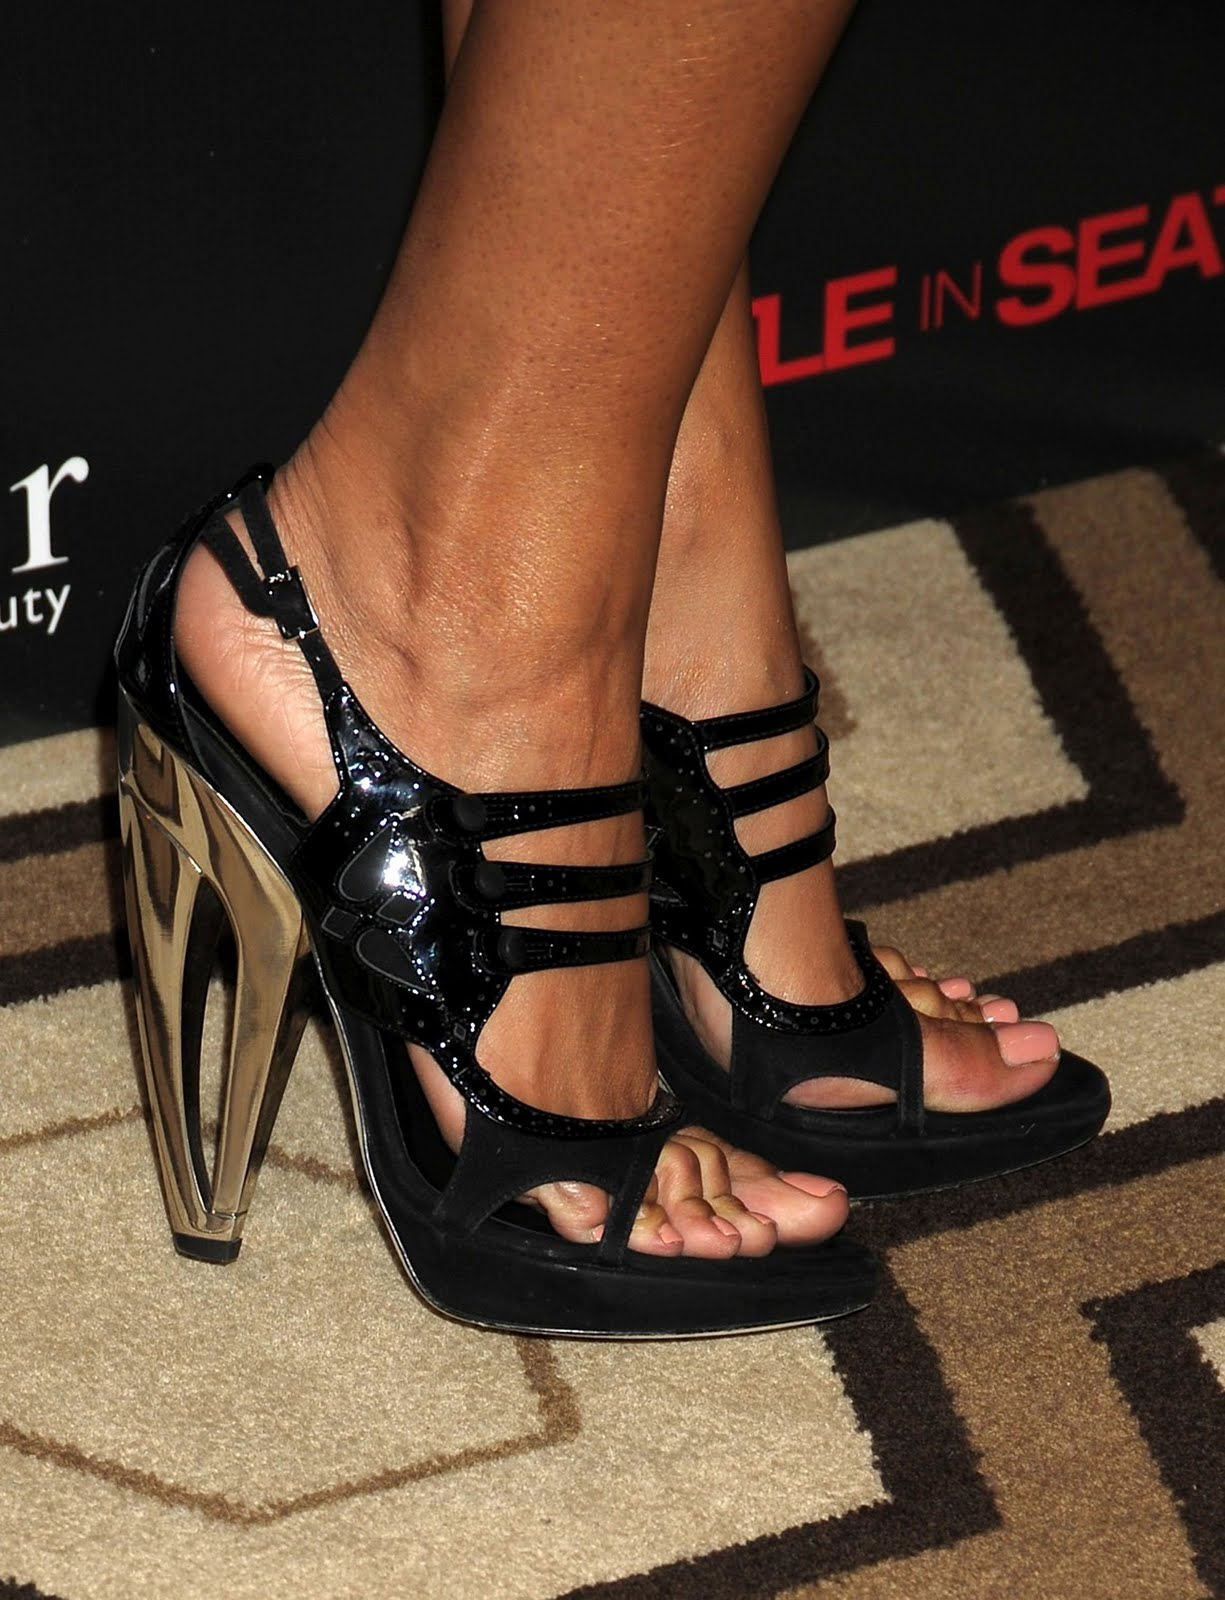 Selita Ebanks Feet | Beautiful Feet Photos